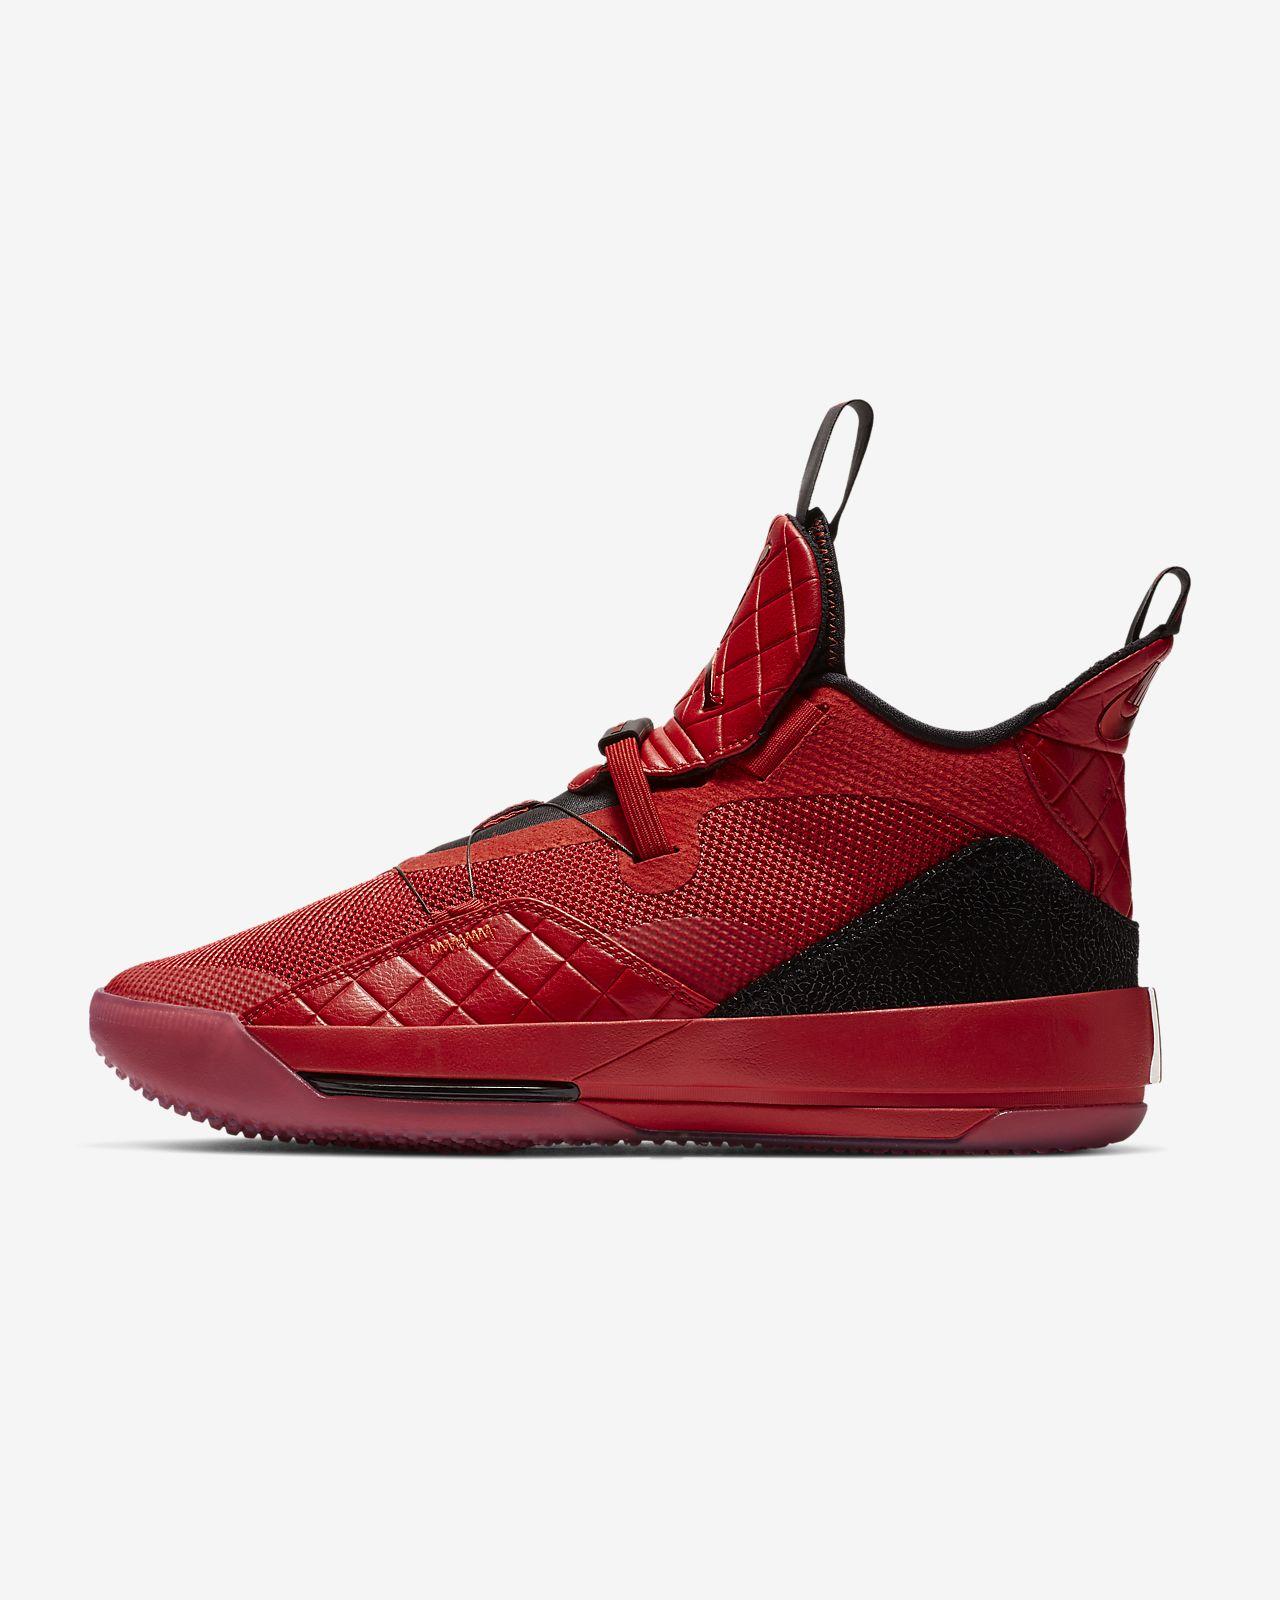 3666ebde8e0923 Air Jordan XXXIII Men s Basketball Shoe. Nike.com SG